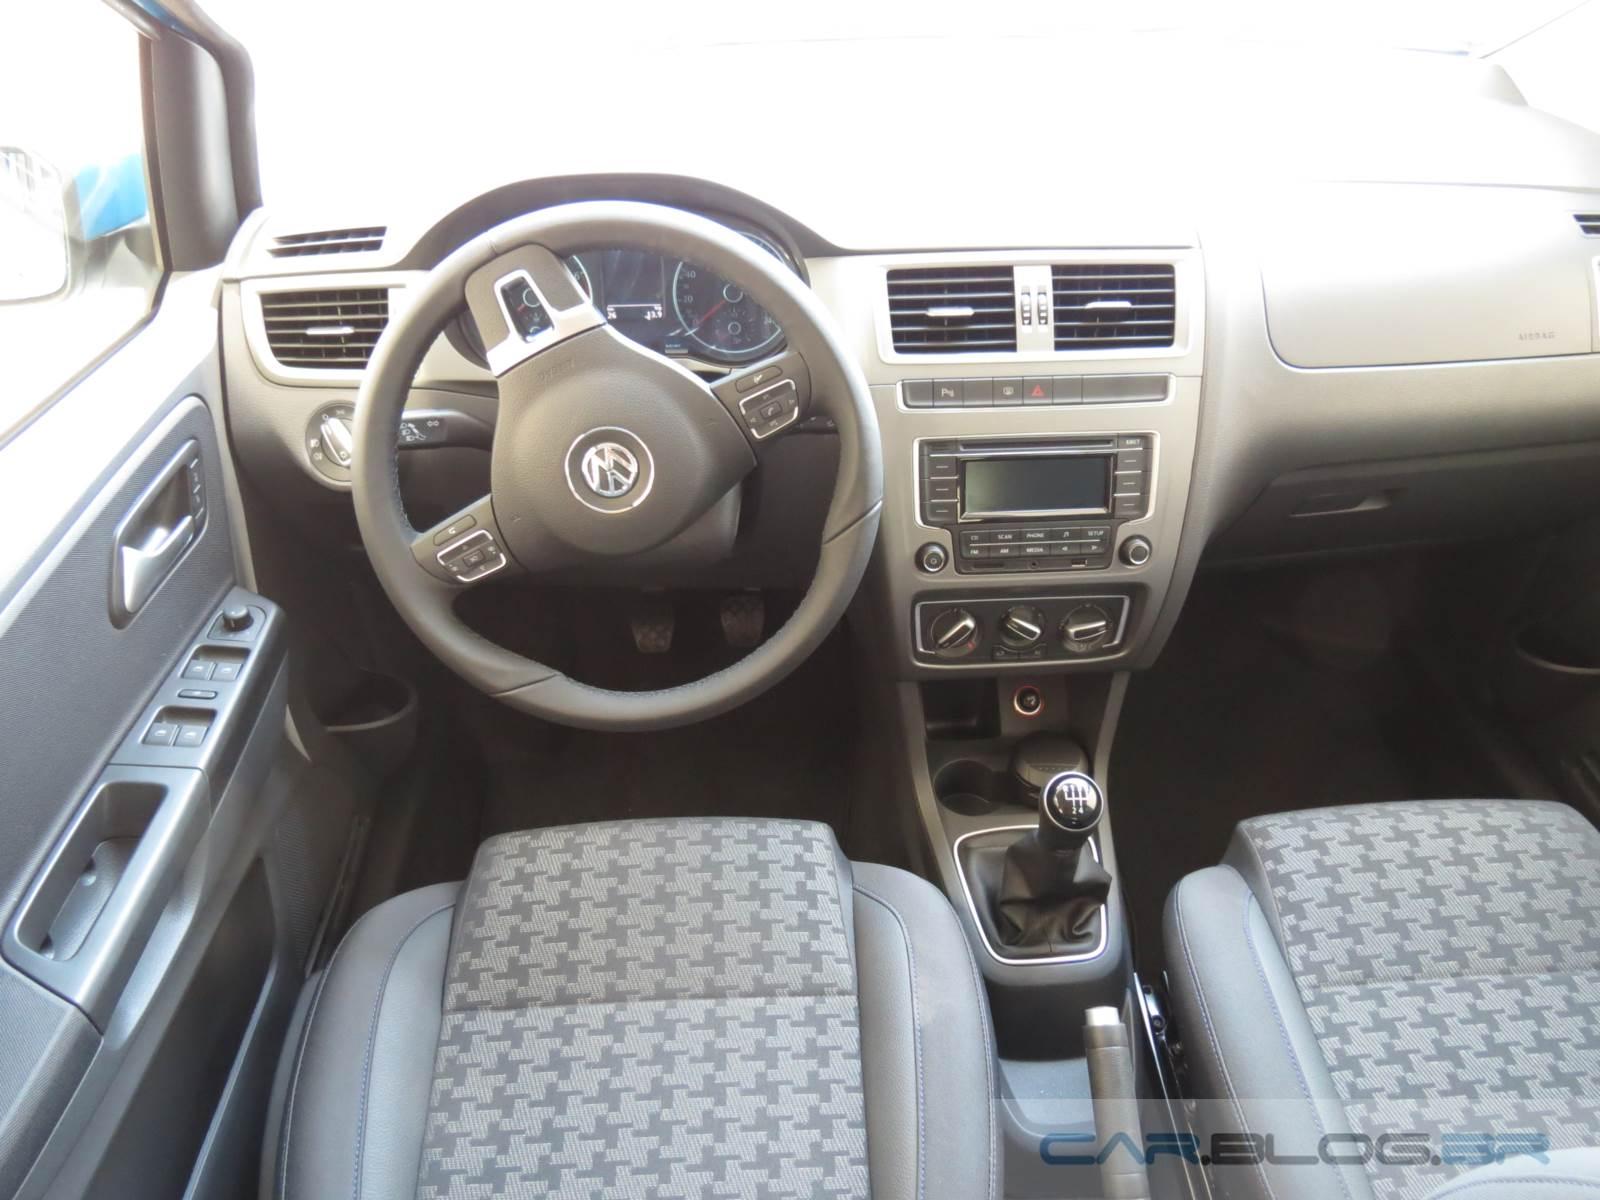 VW Fox Comfortline 2015 - interior - painel